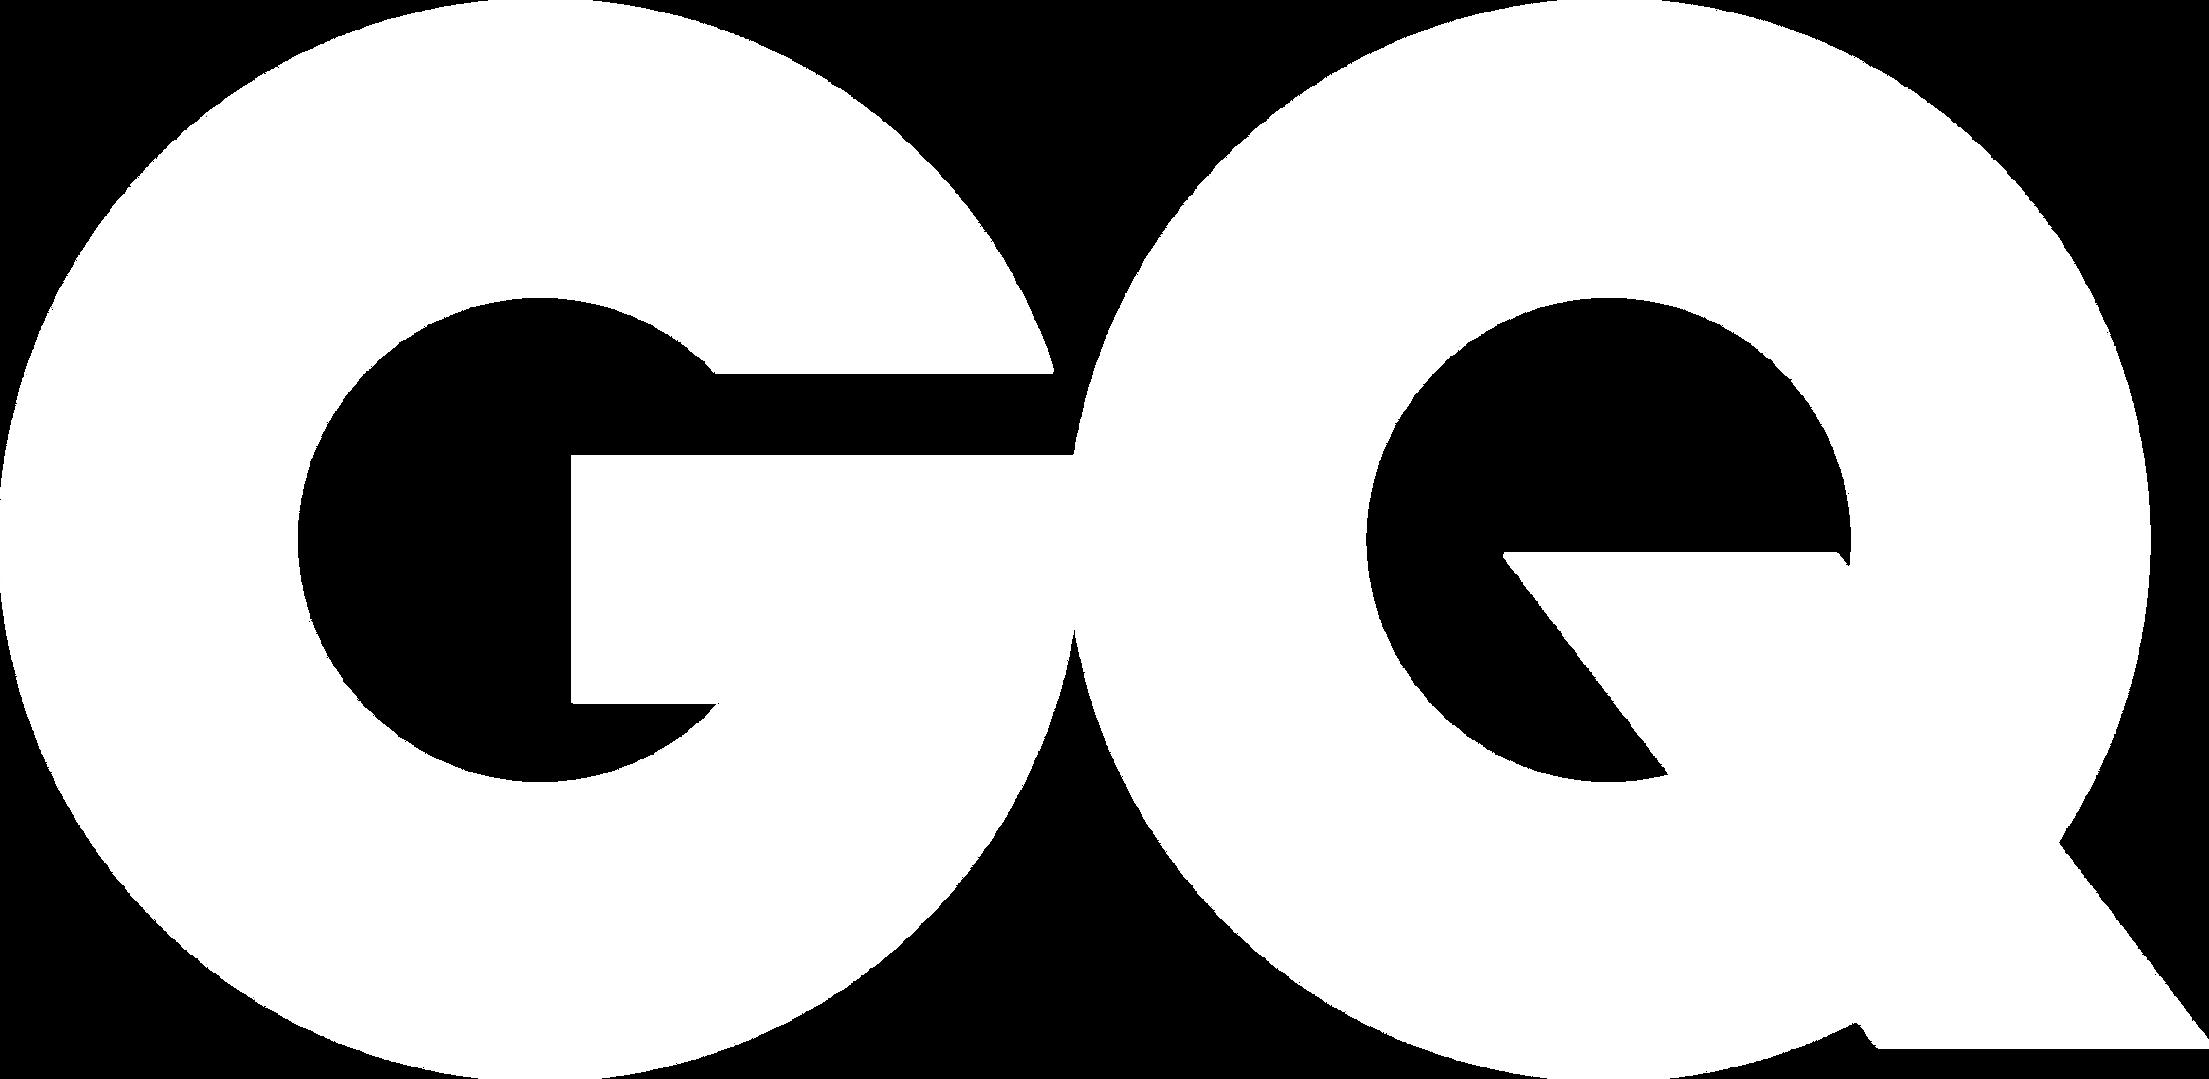 223-2236482_gq-magazine-logo-black-and-w